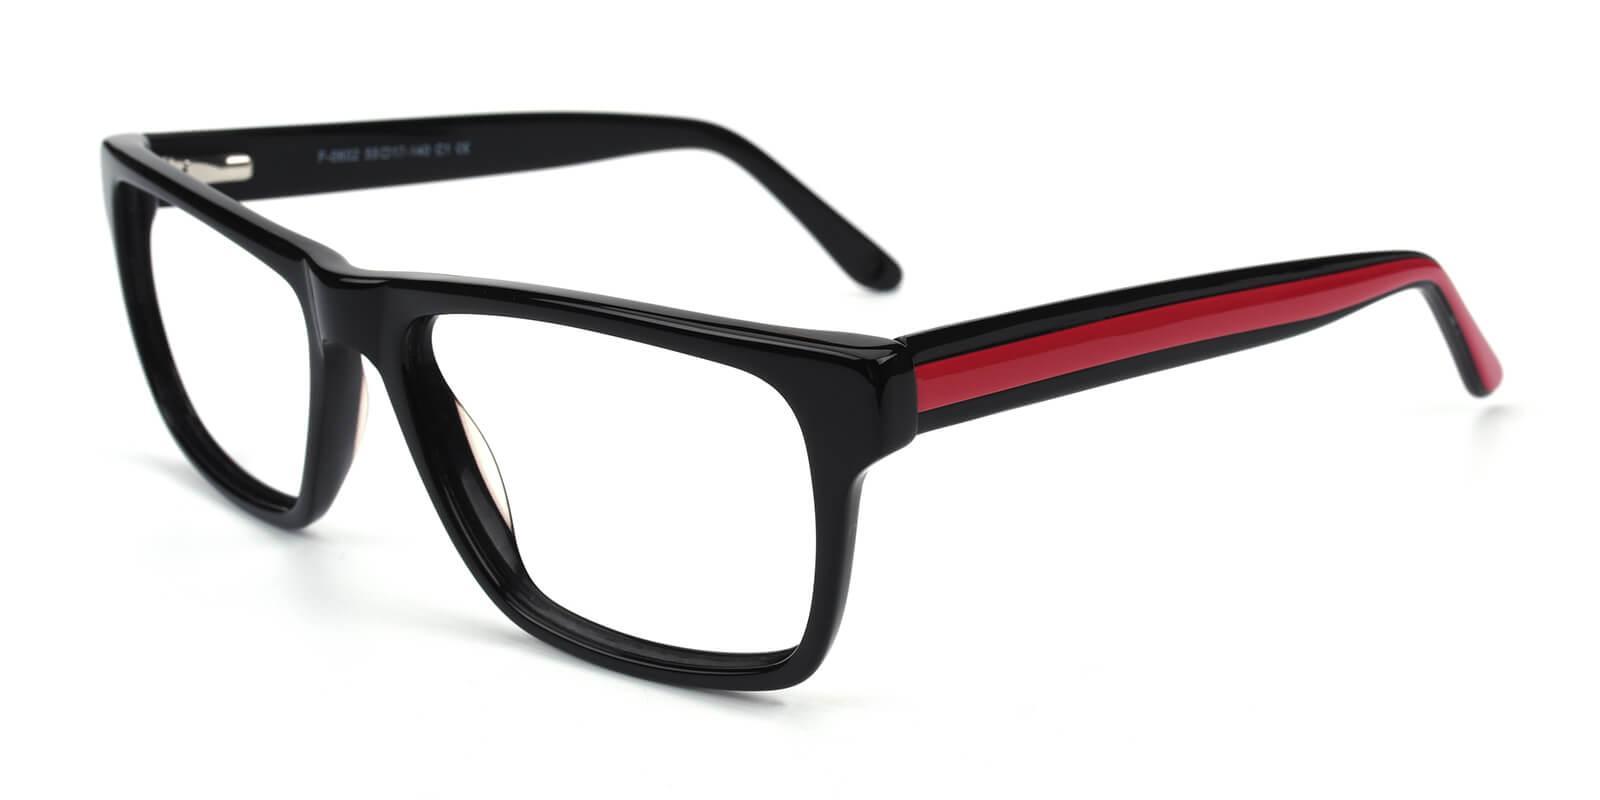 Nightdream-Black-Square-Acetate-Eyeglasses-additional1